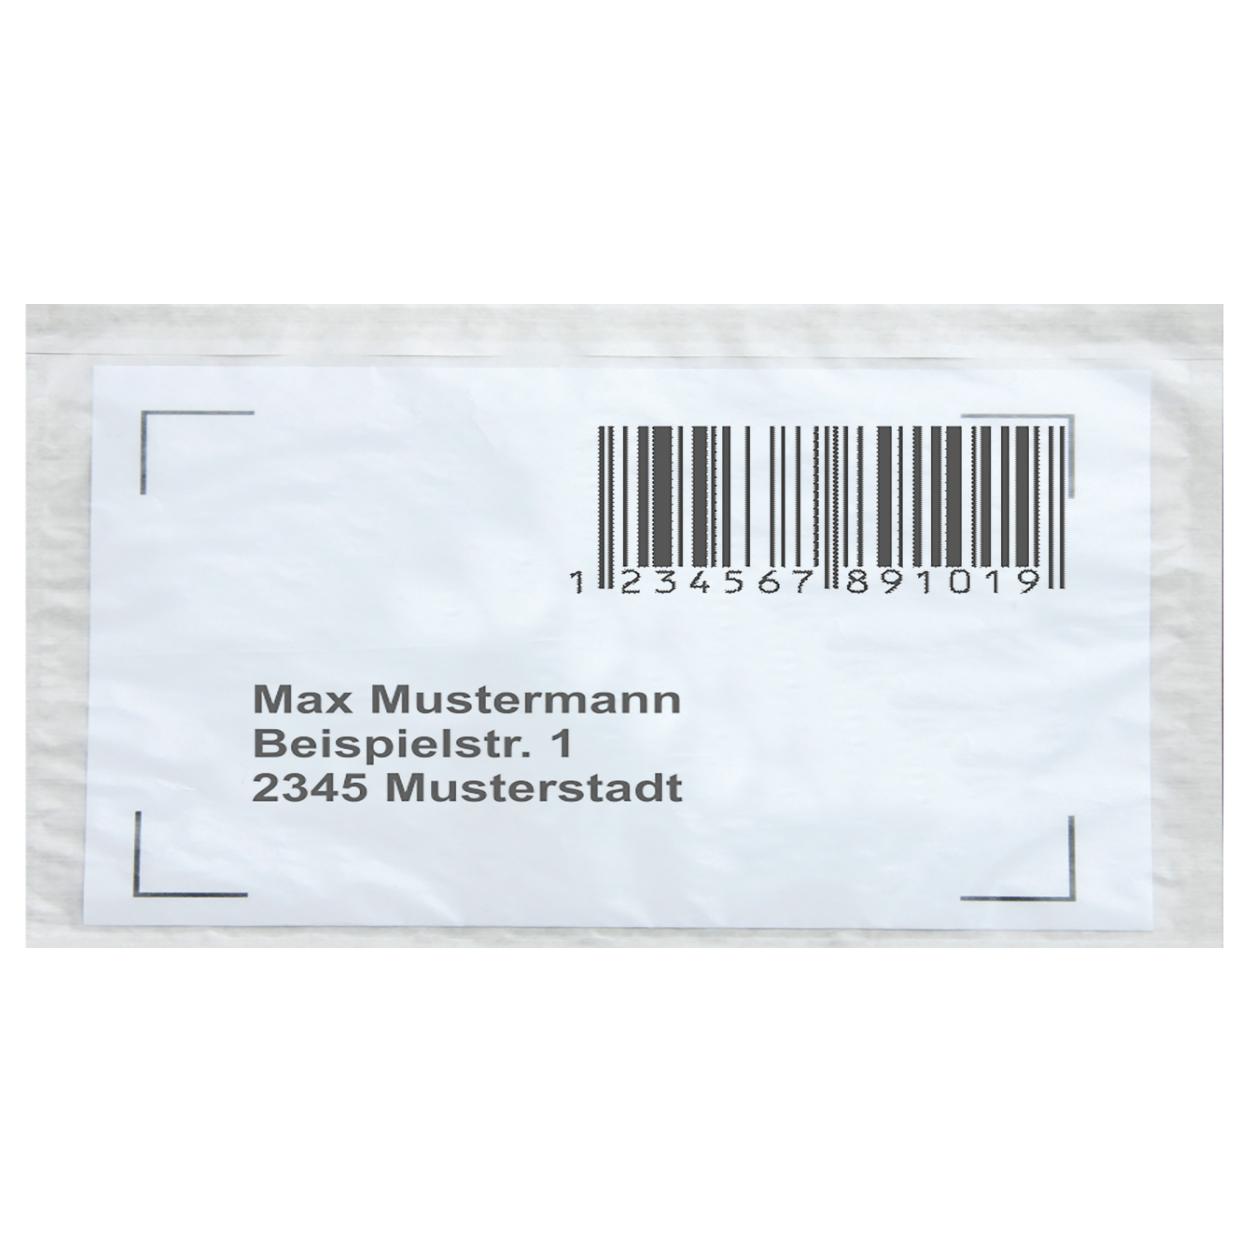 Lieferscheintaschen / Begleitpapiertaschen aus Papier / farblos / DIN lang